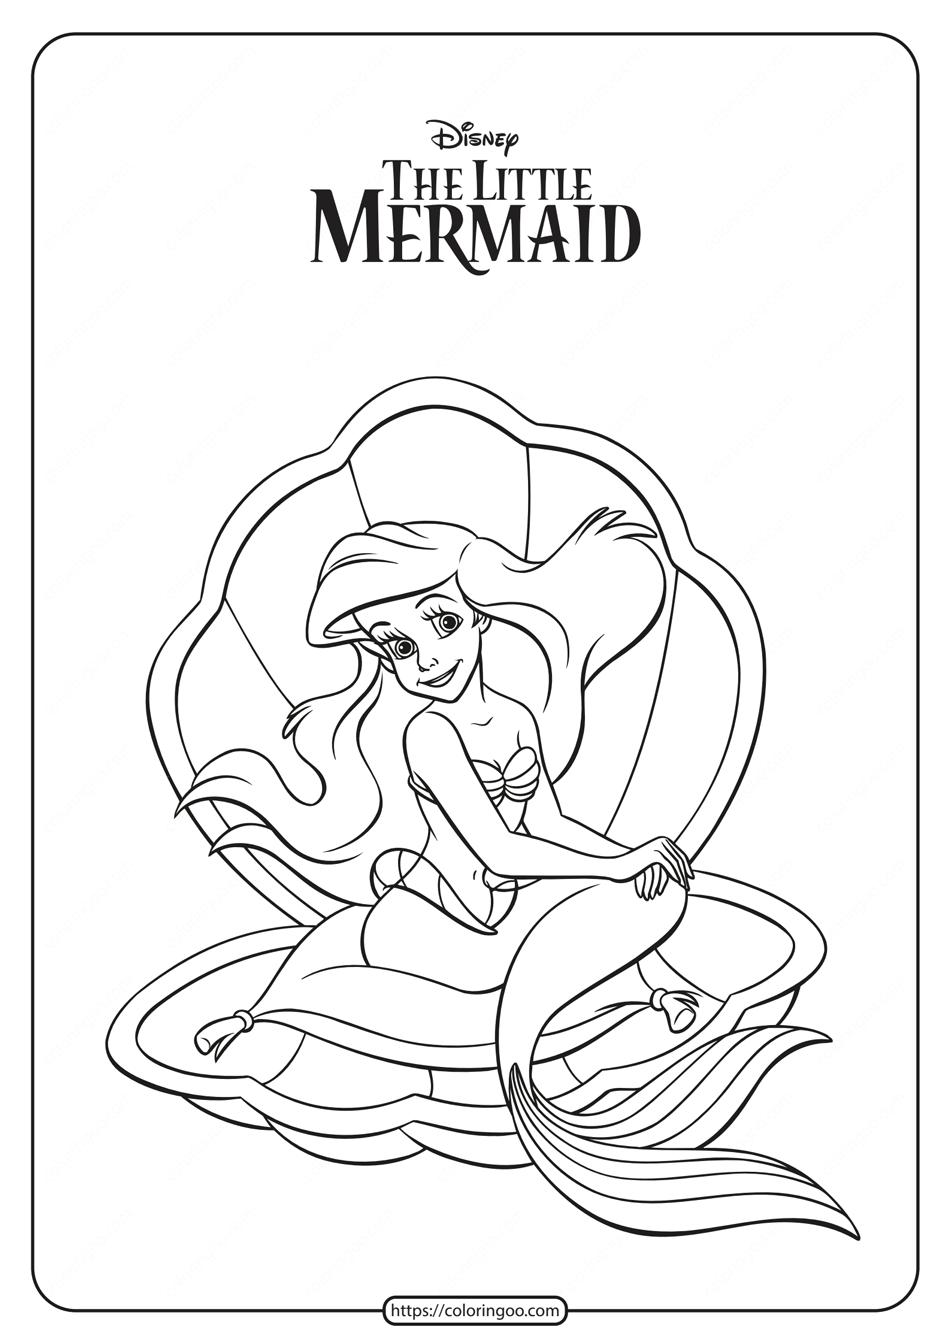 Printable Princess Ariel Coloring Pages Ariel Coloring Pages Mermaid Coloring Pages Mermaid Coloring Book